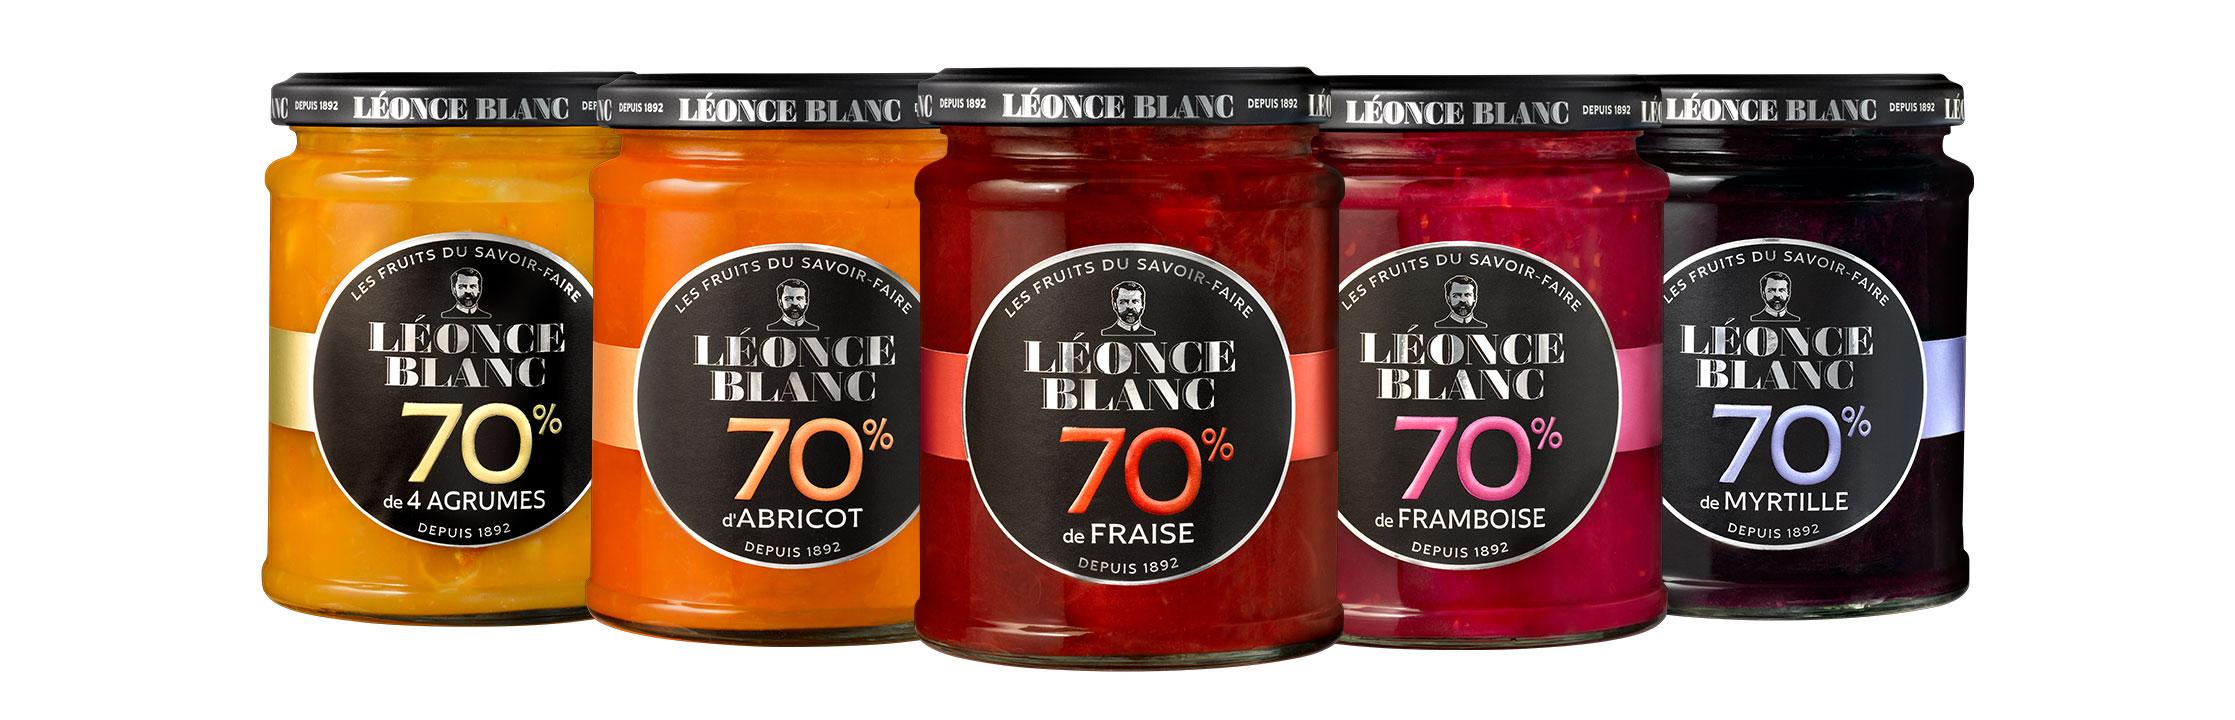 Gamme 70% 320g Léonce Blanc